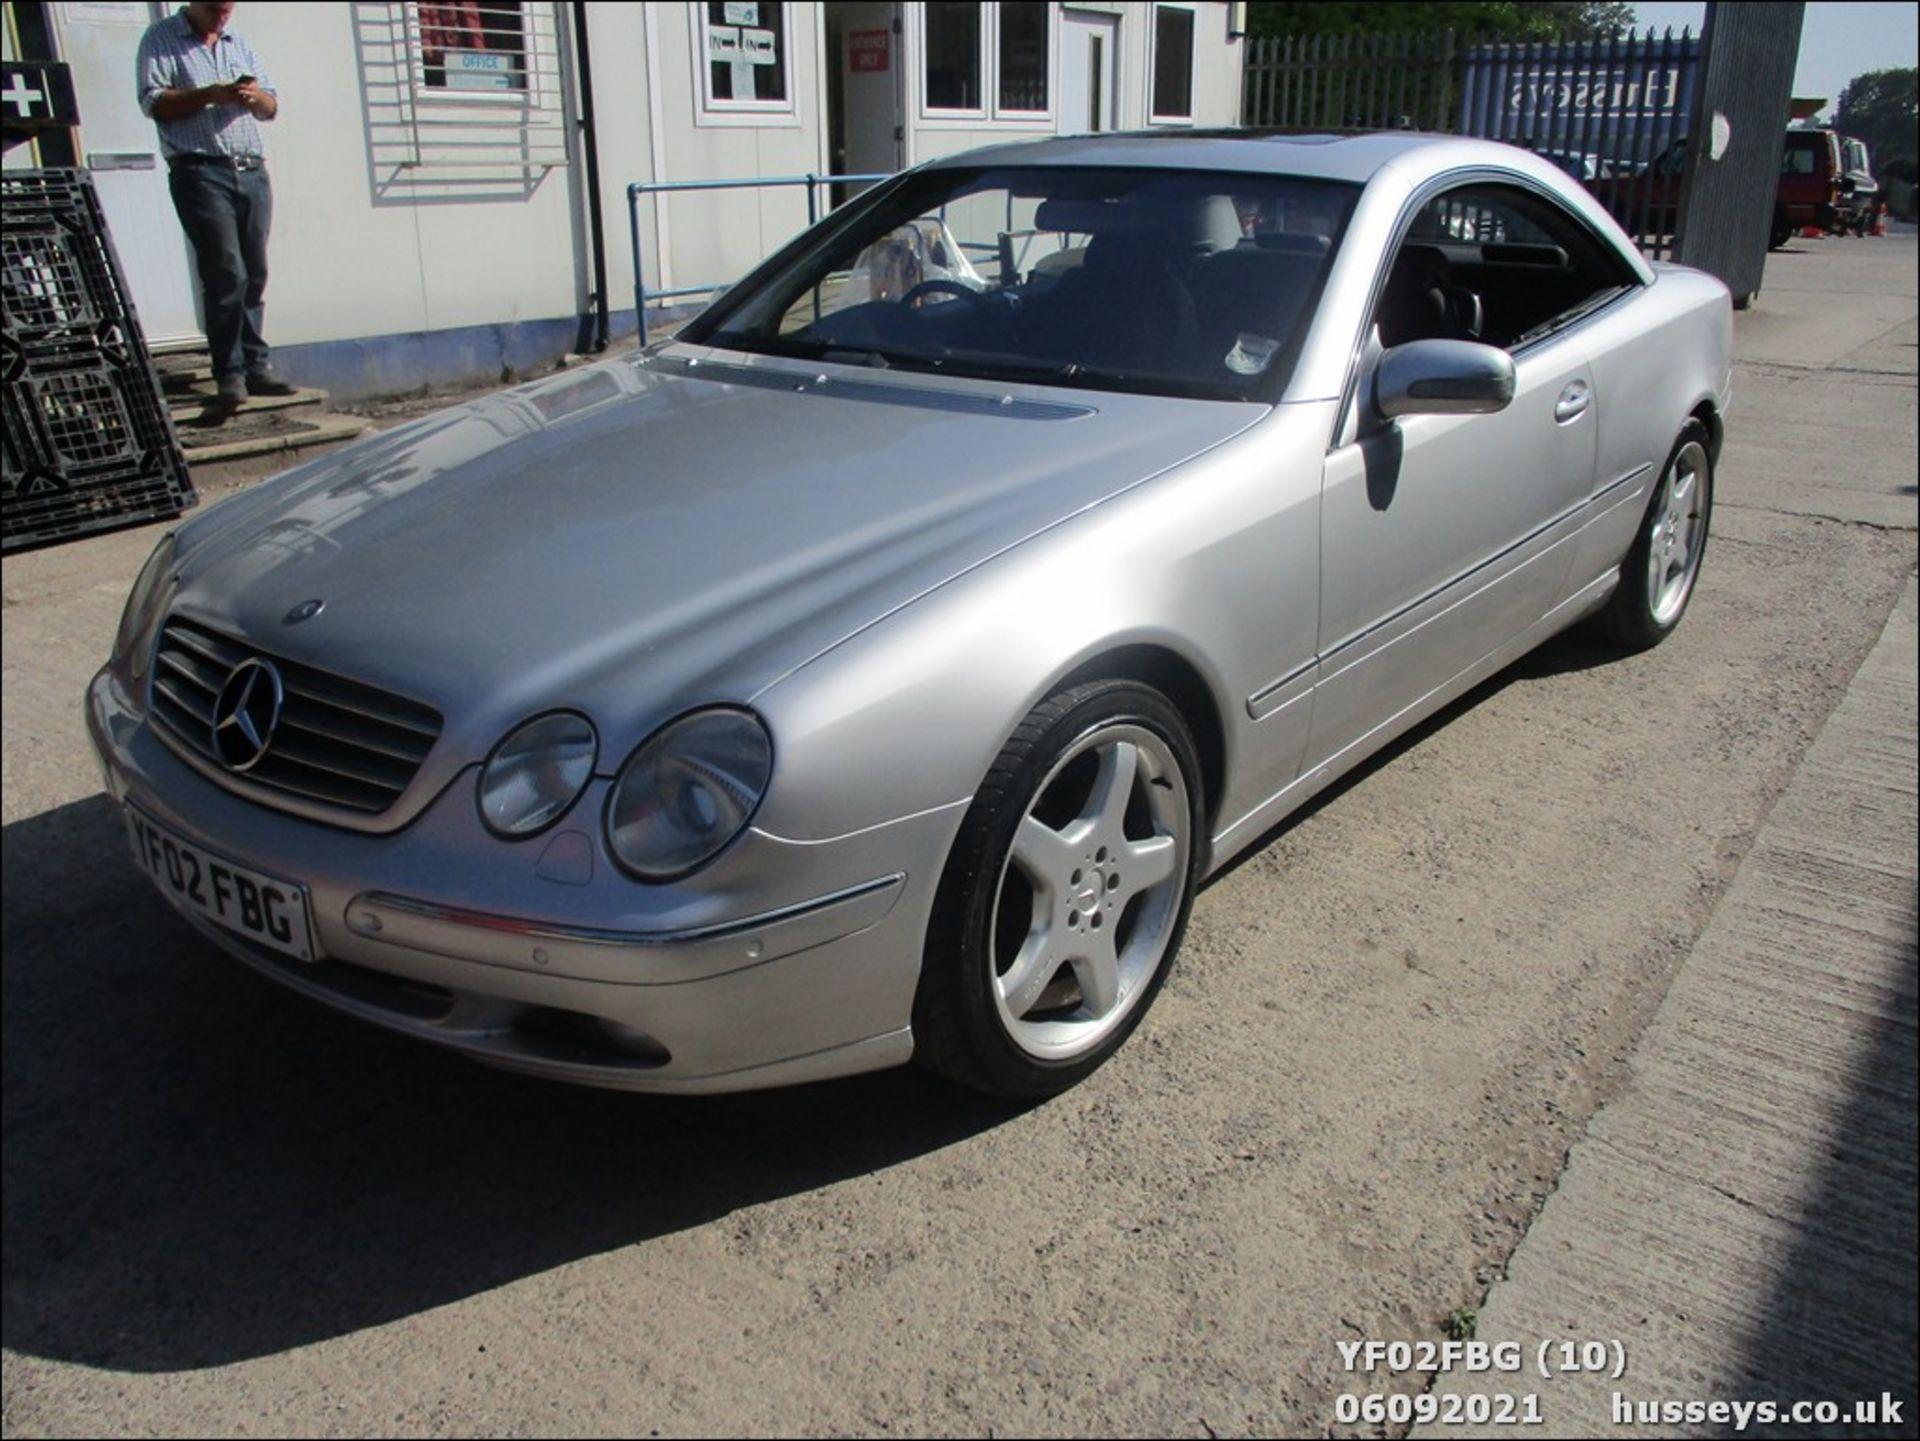 02/02 MERCEDES CL500 AUTO - 4966cc 2dr Coupe (Silver, 64k) - Image 10 of 16